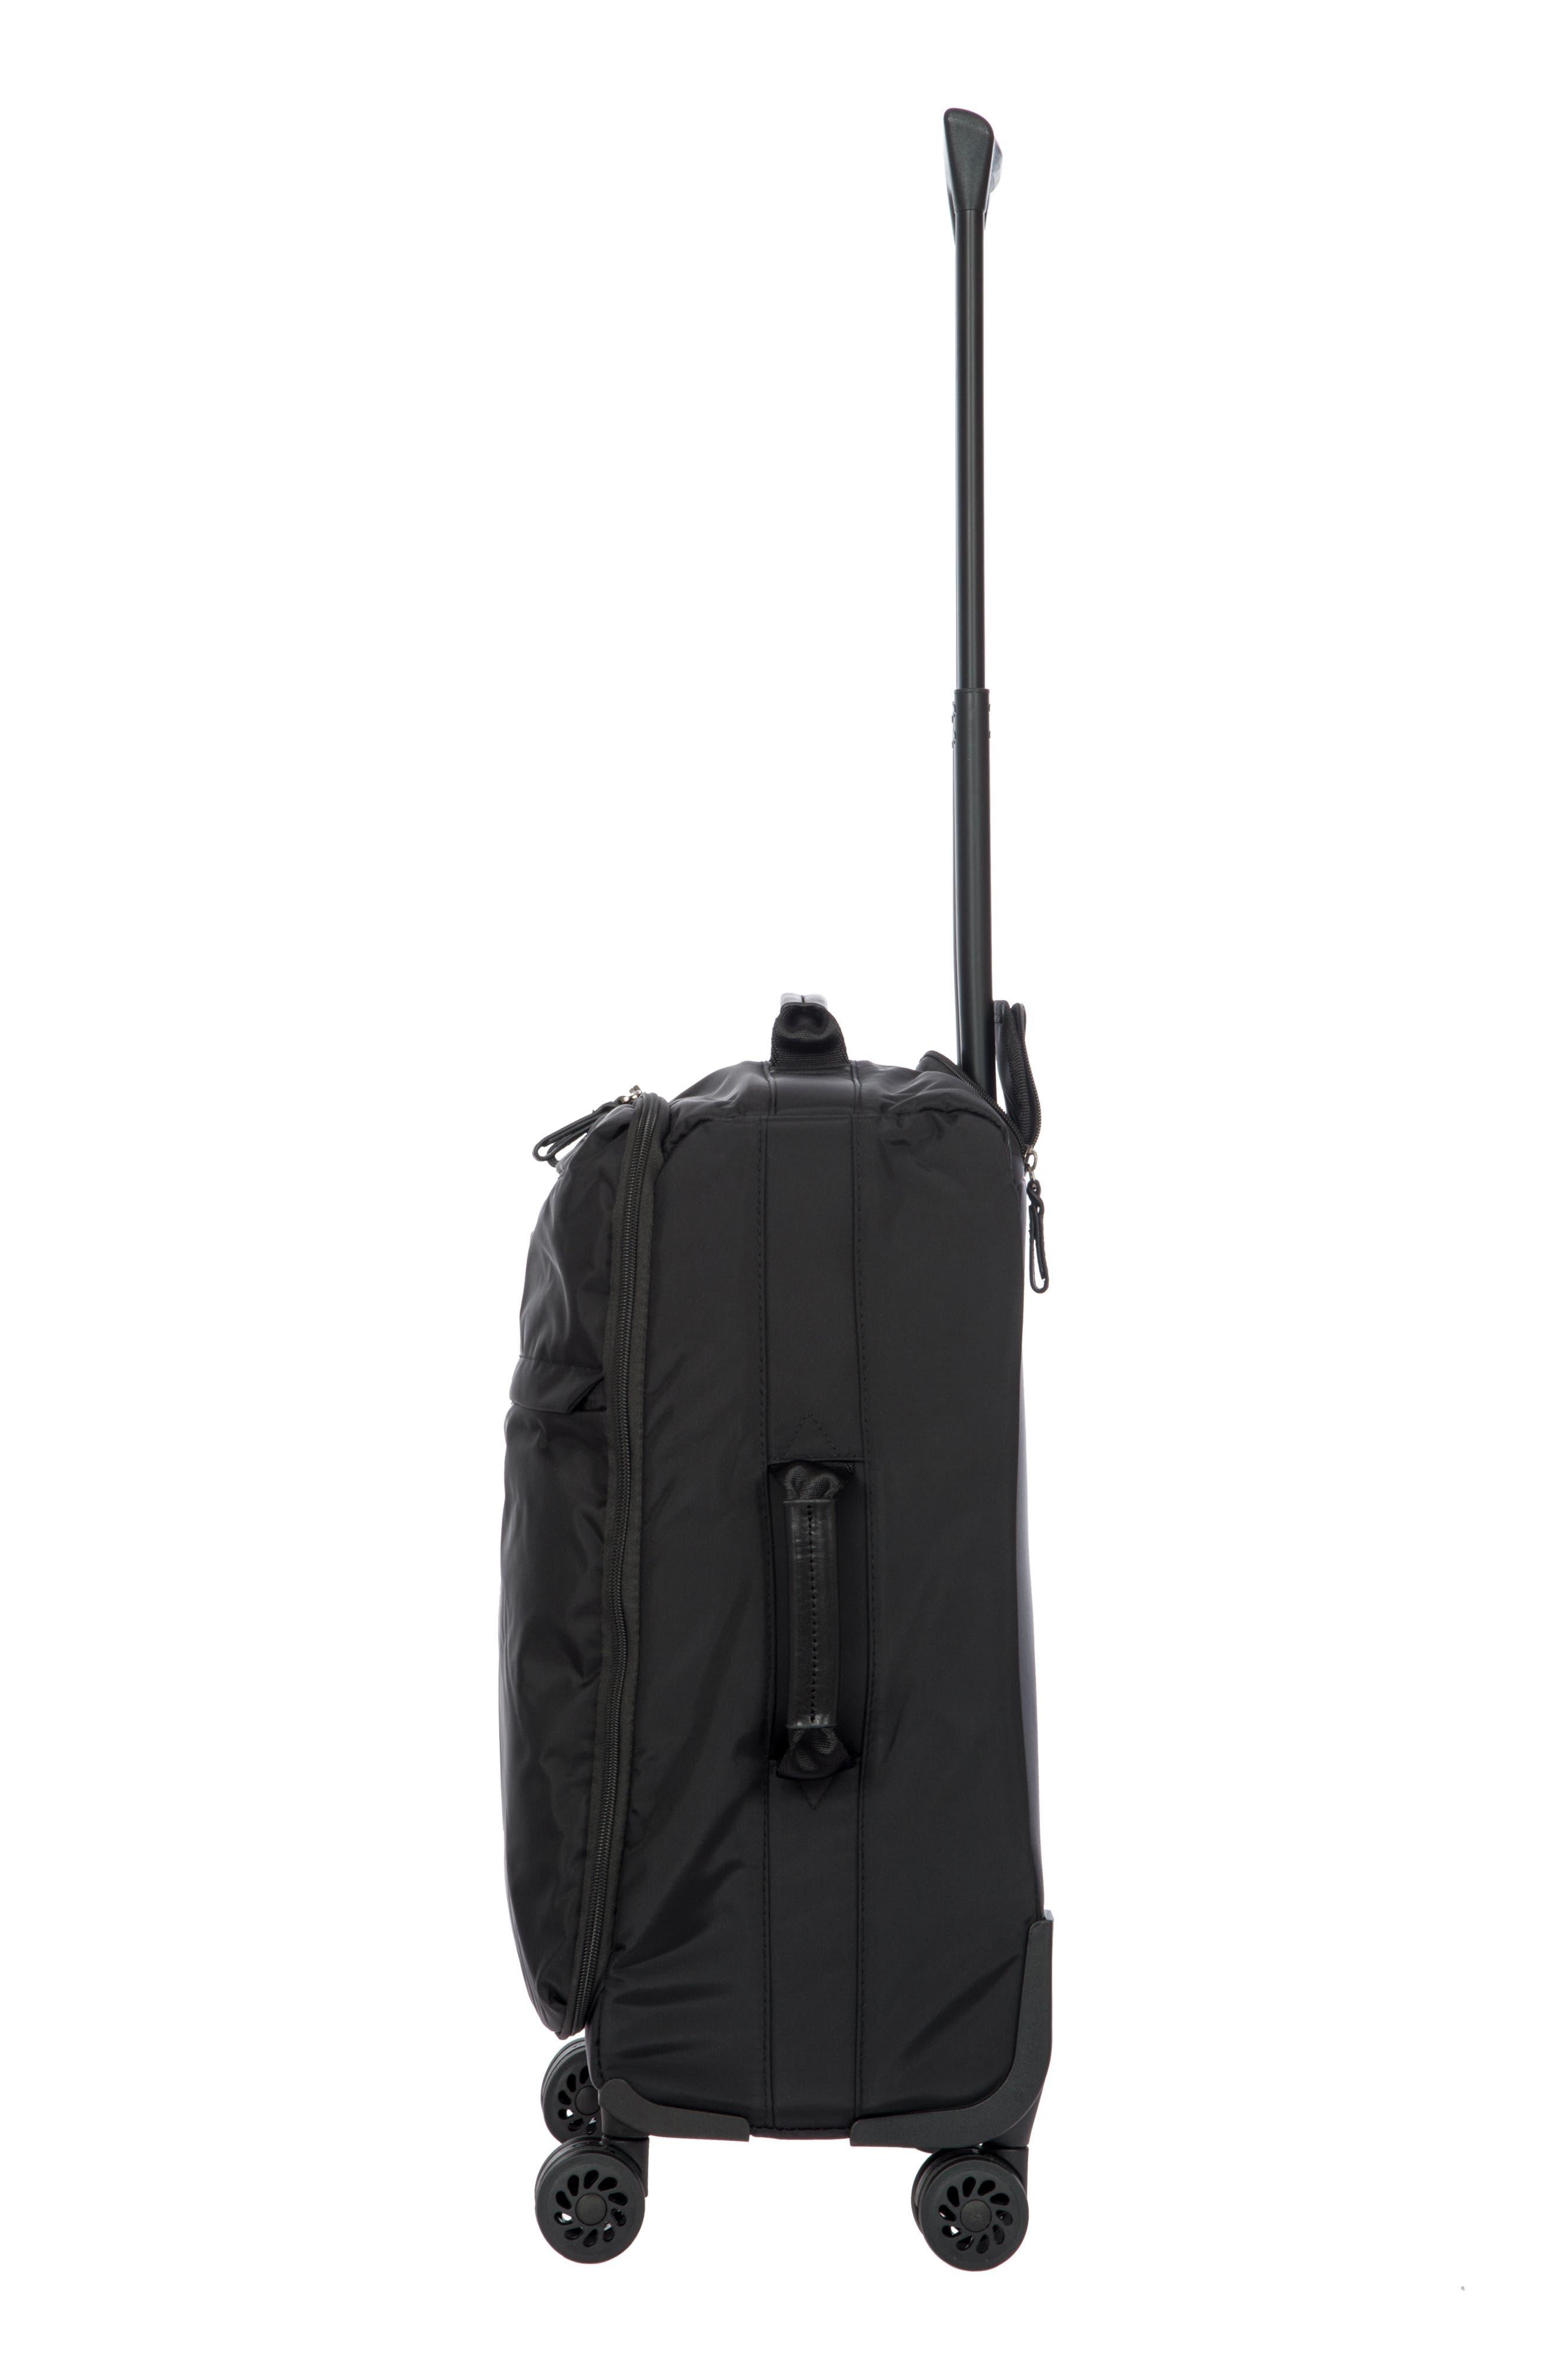 X-Bag 21-Inch Spinner Carry-On,                             Alternate thumbnail 3, color,                             Black/ Black